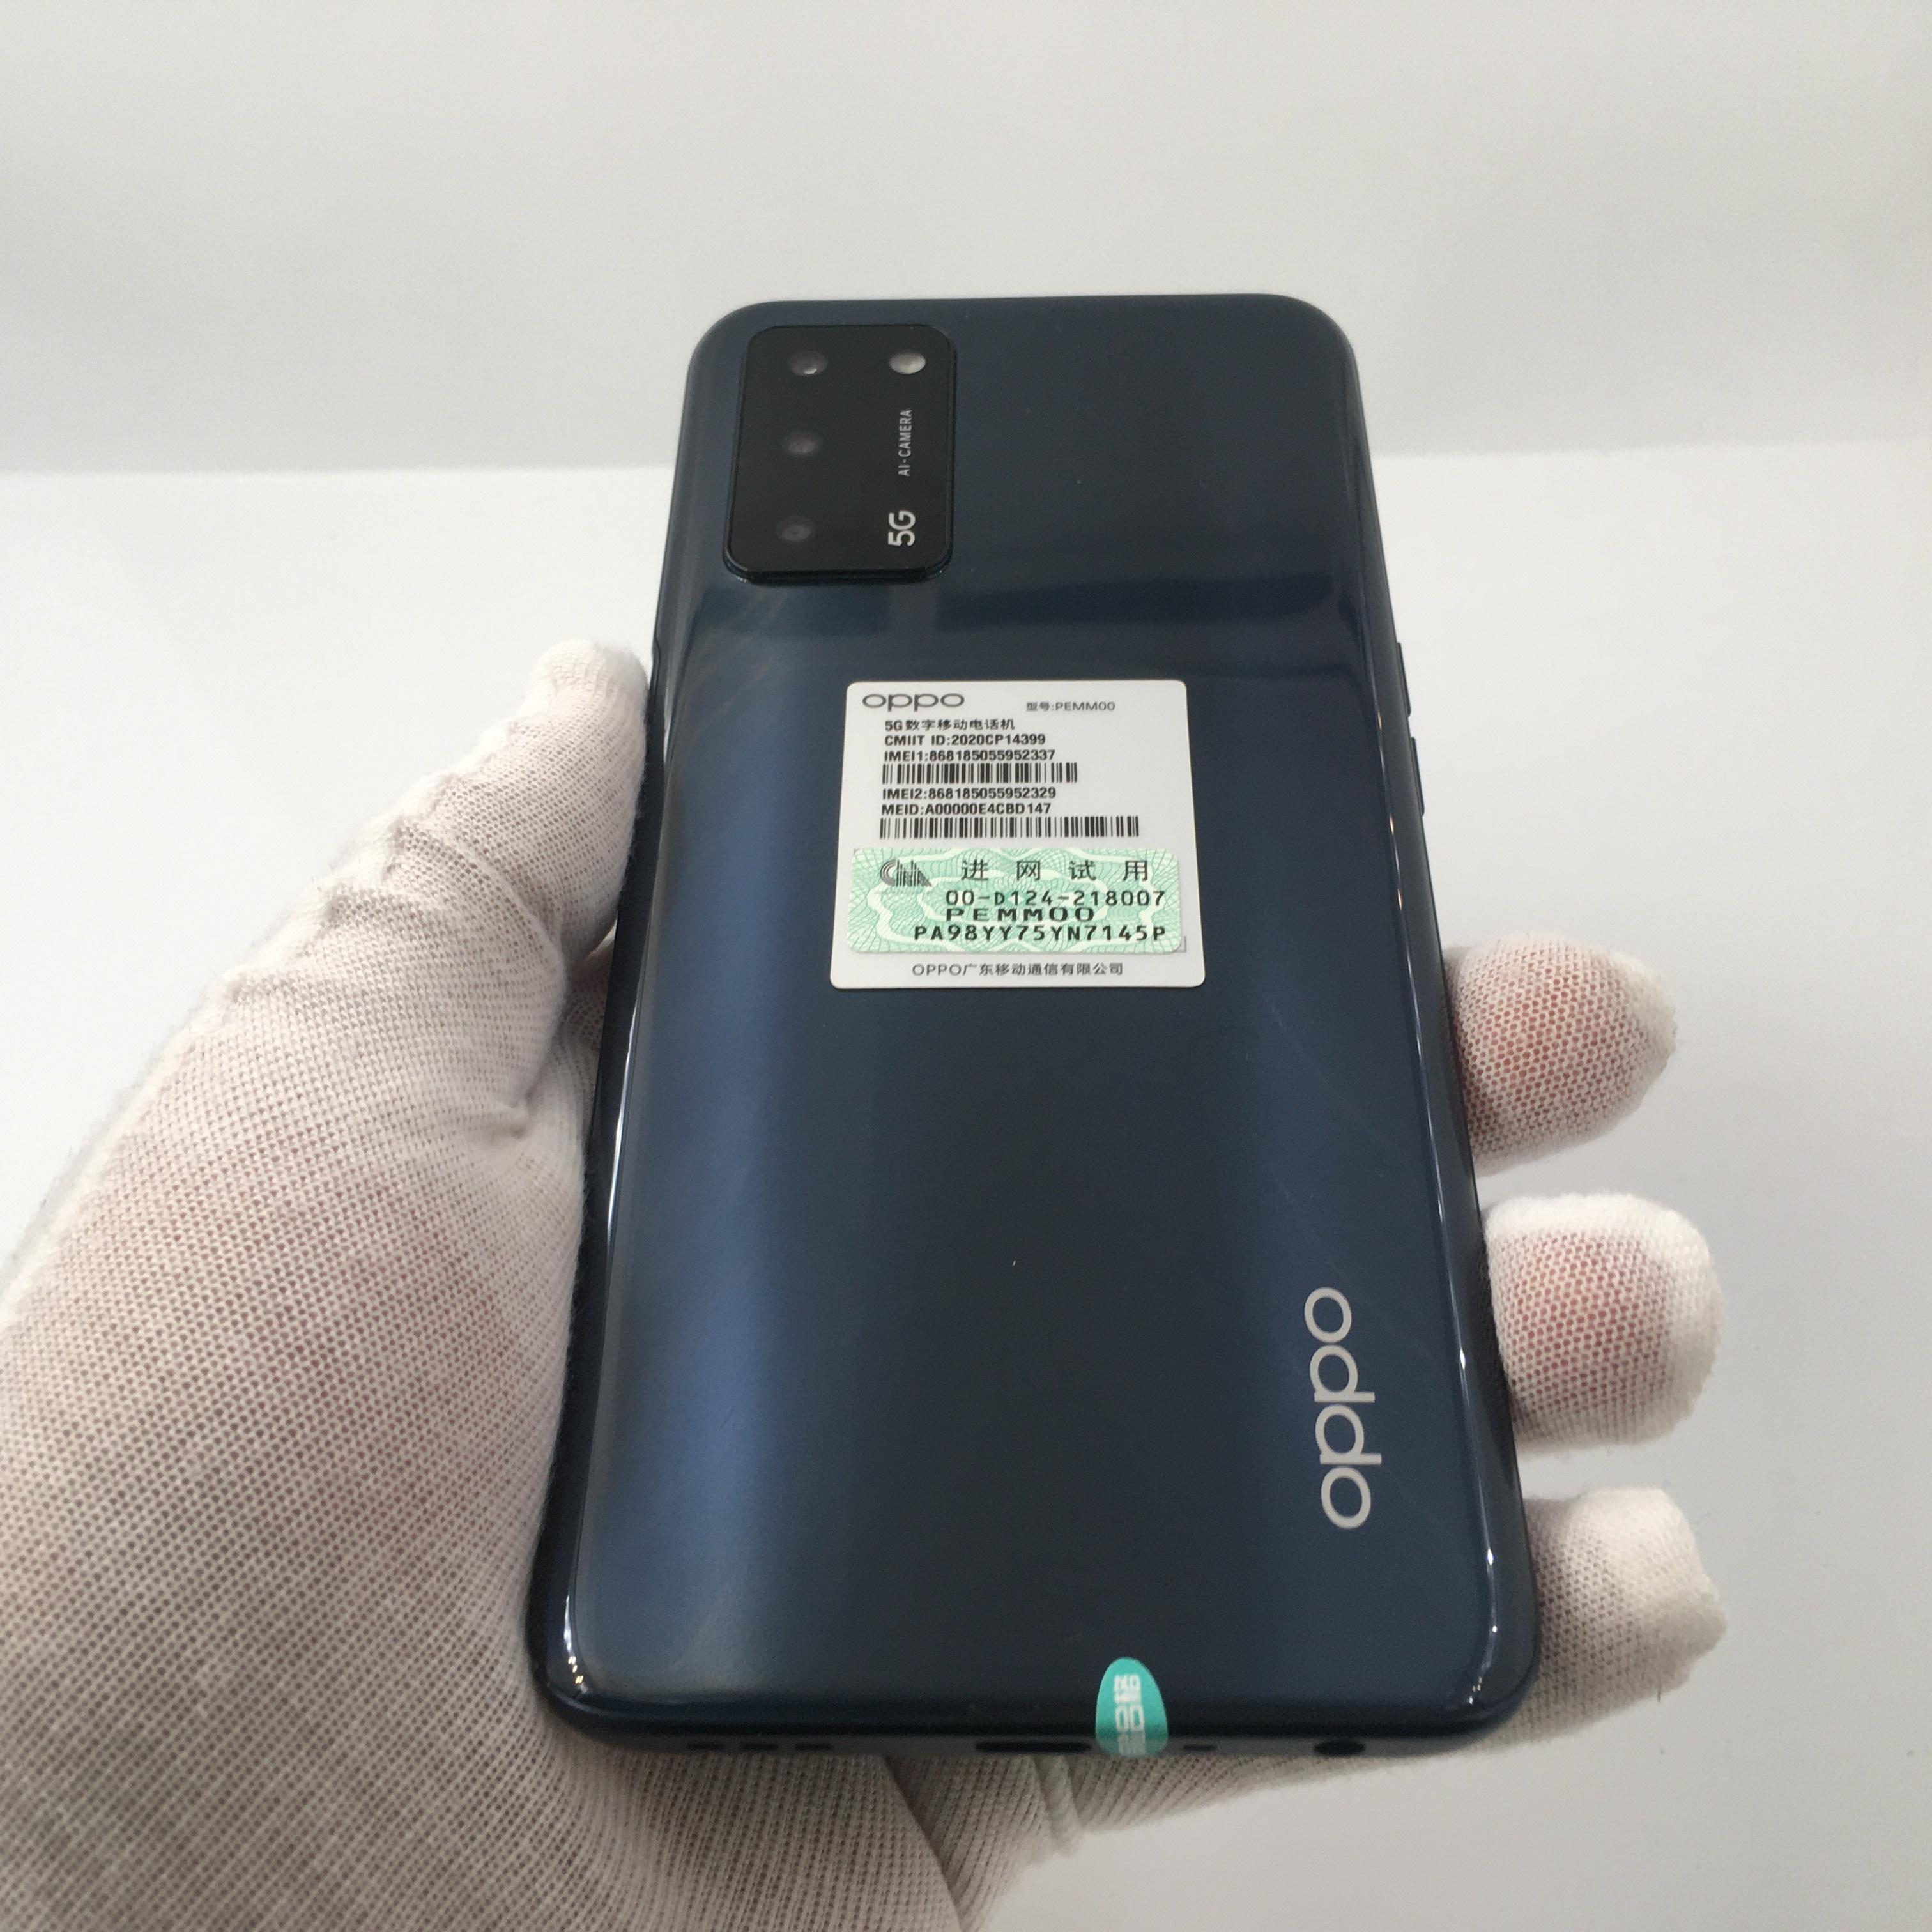 oppo【A55】5G全网通 律动黑 6G/128G 国行 99新